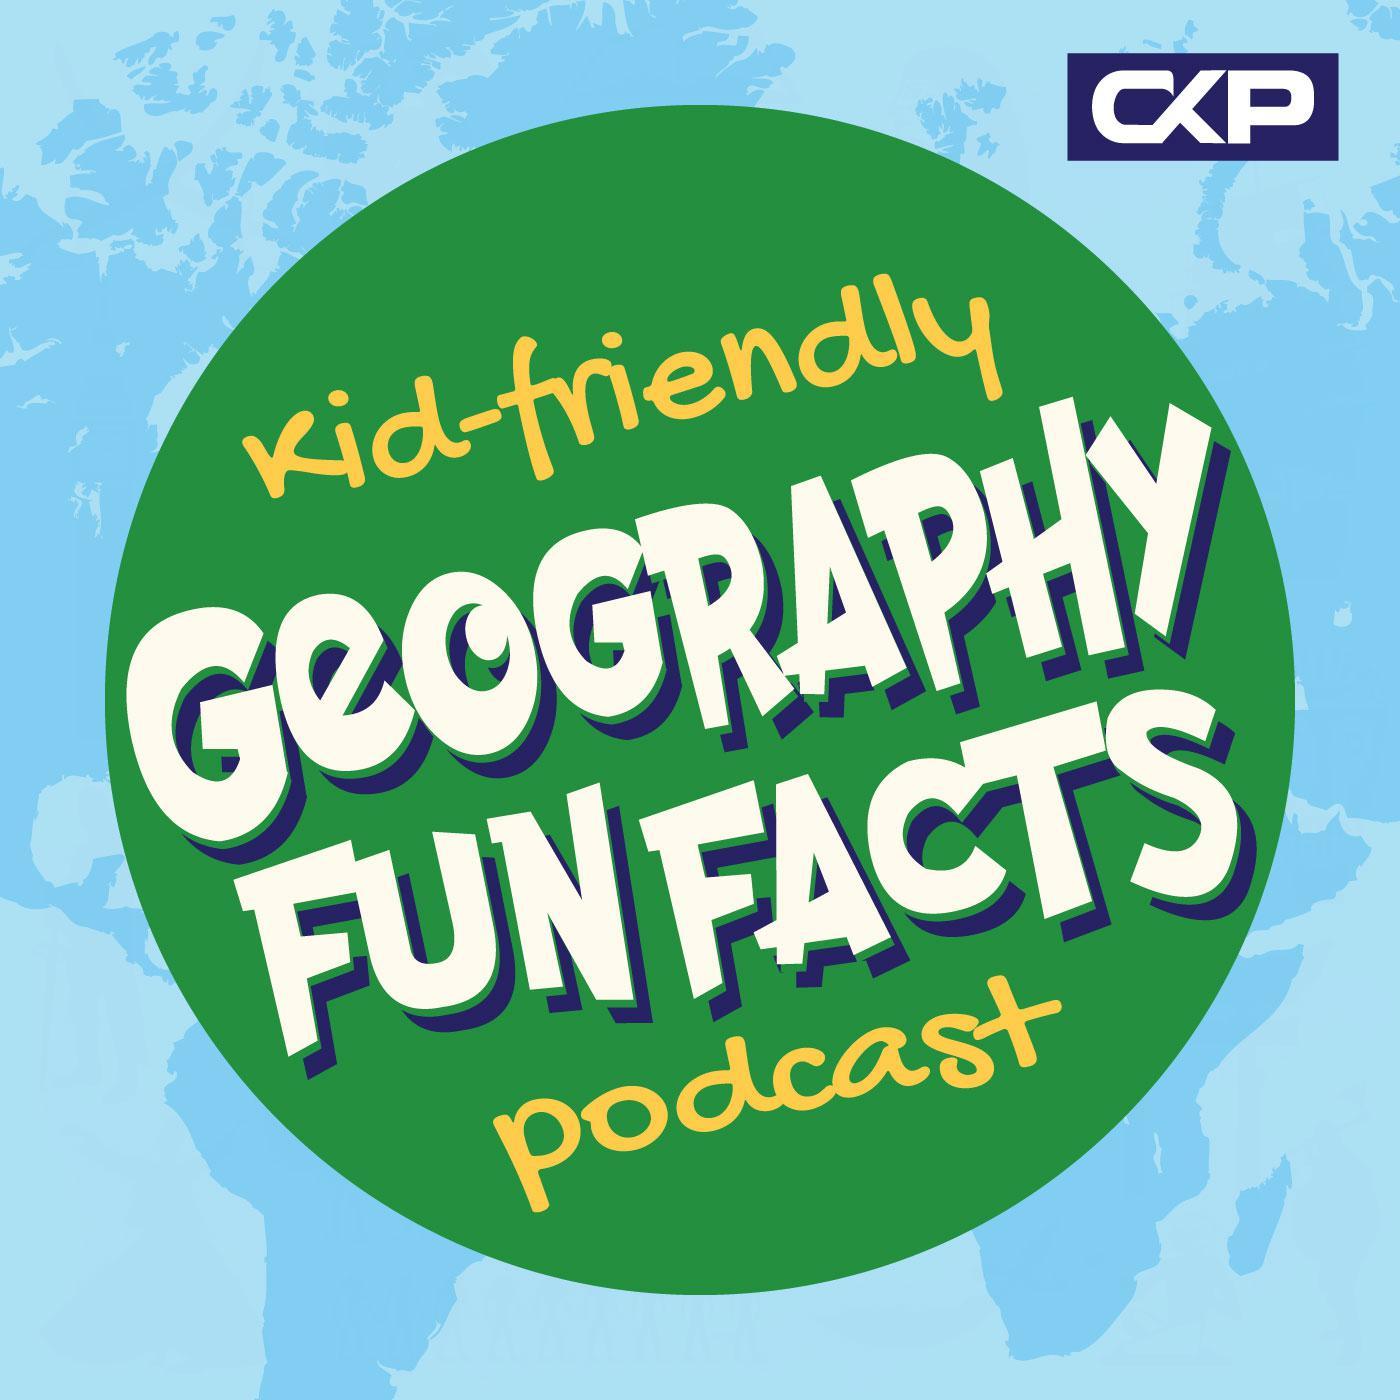 Kid Friendly Geography Fun Facts Podcast - Chris Krimitsos | Listen